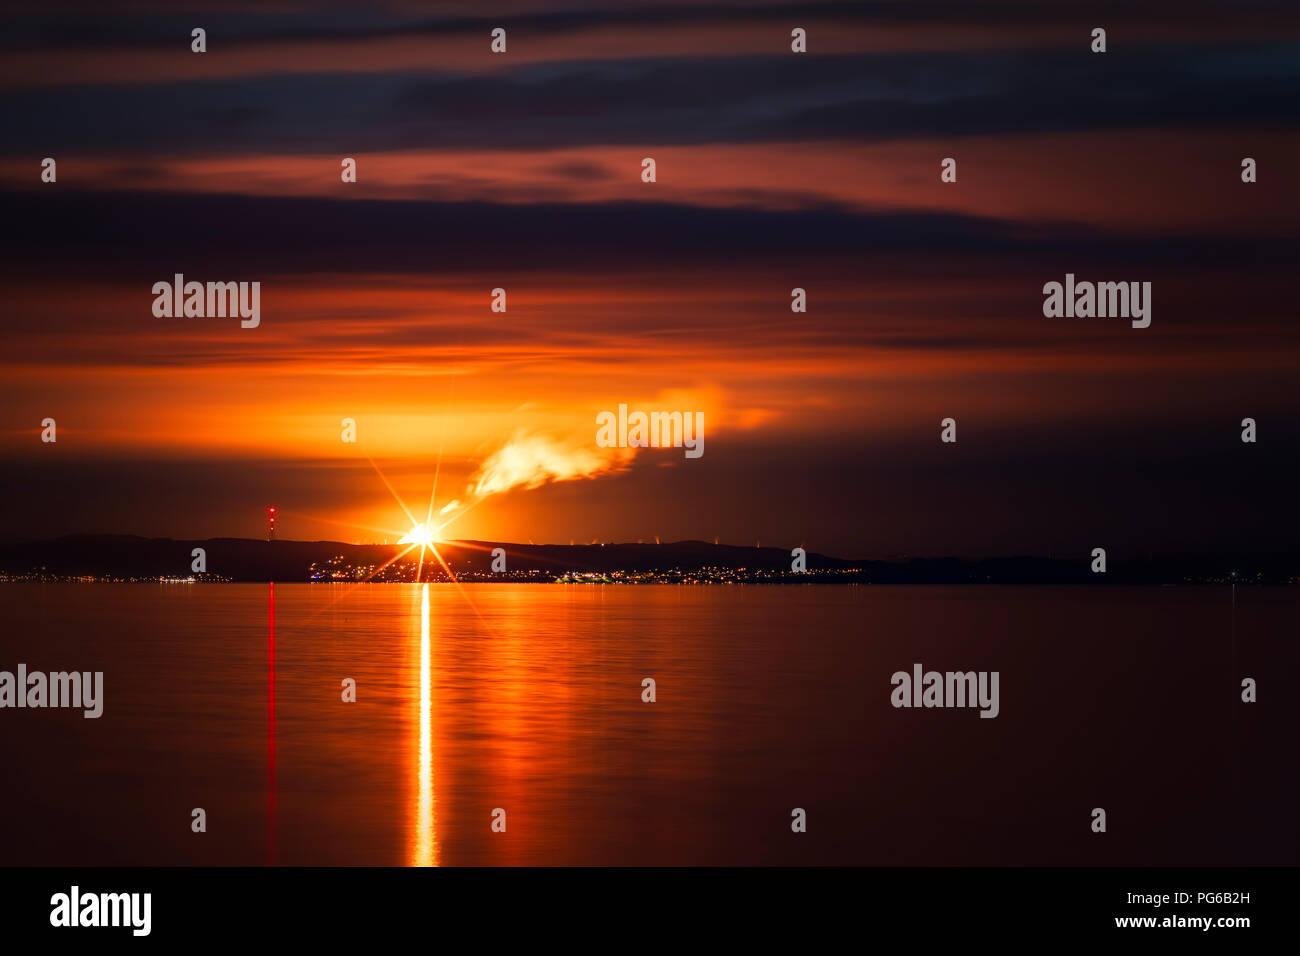 UK, Scotland, Fife, Cowdenbeath, Mossmorran Flare, Mossmorran Natural Gas fractionation plant - Stock Image